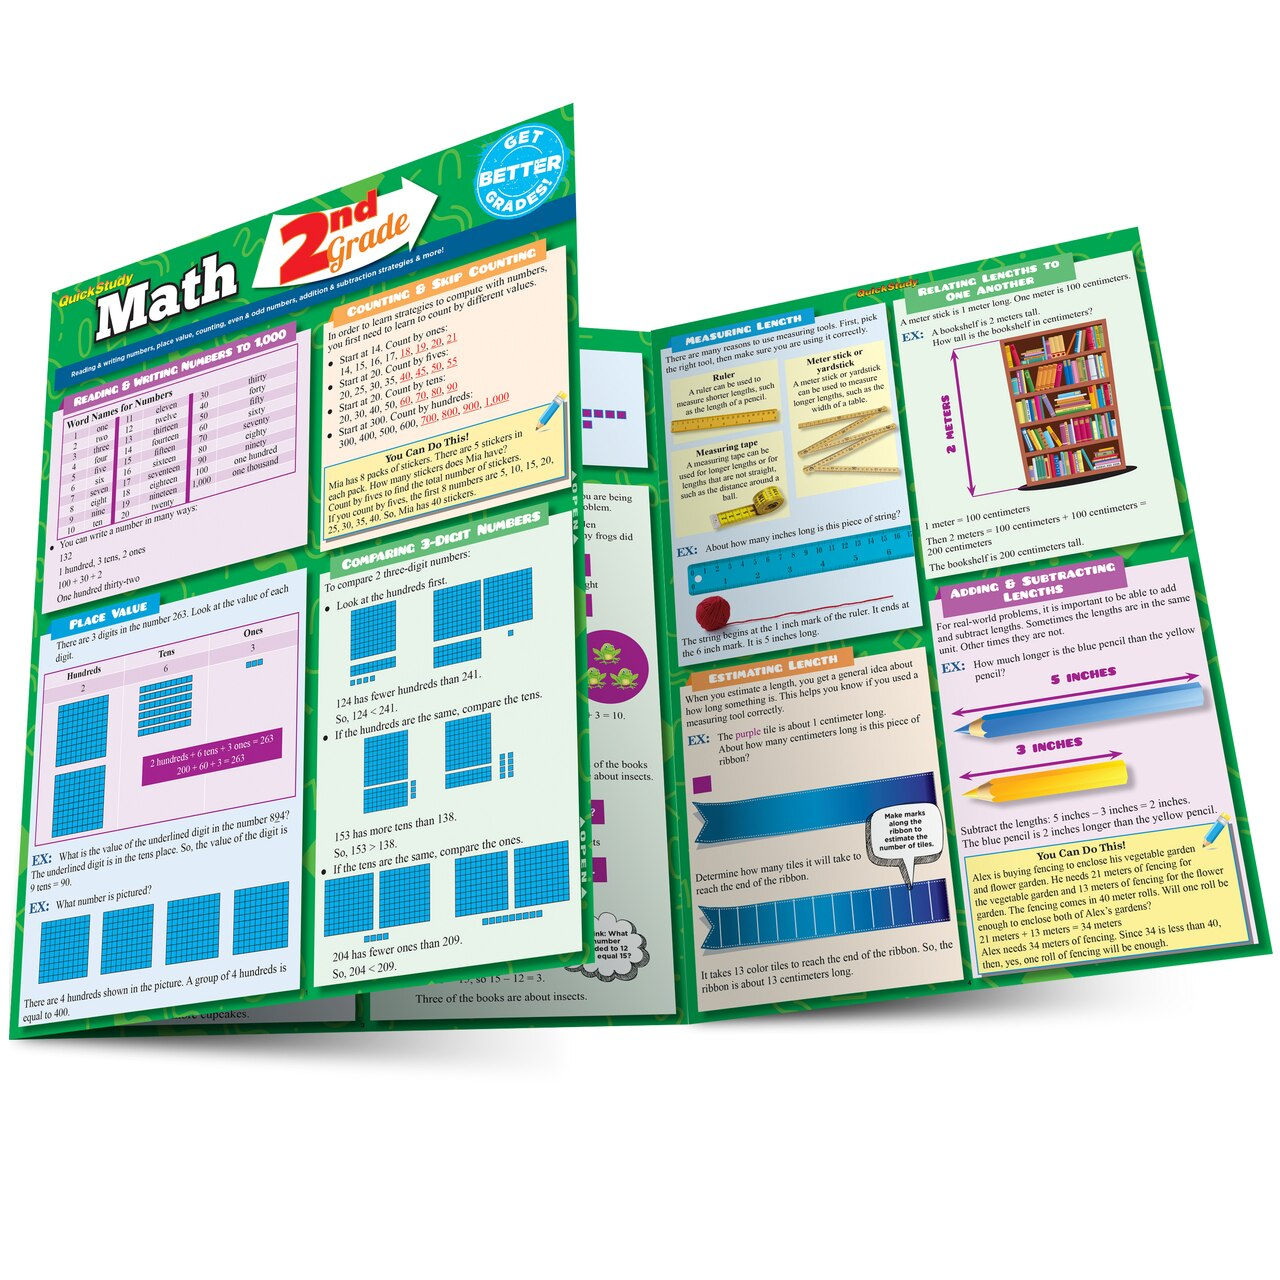 Quick Study QuickStudy Math: 2nd Grade Laminated Study Guide BarCharts Publishing Mathematics Study Outline Main Image